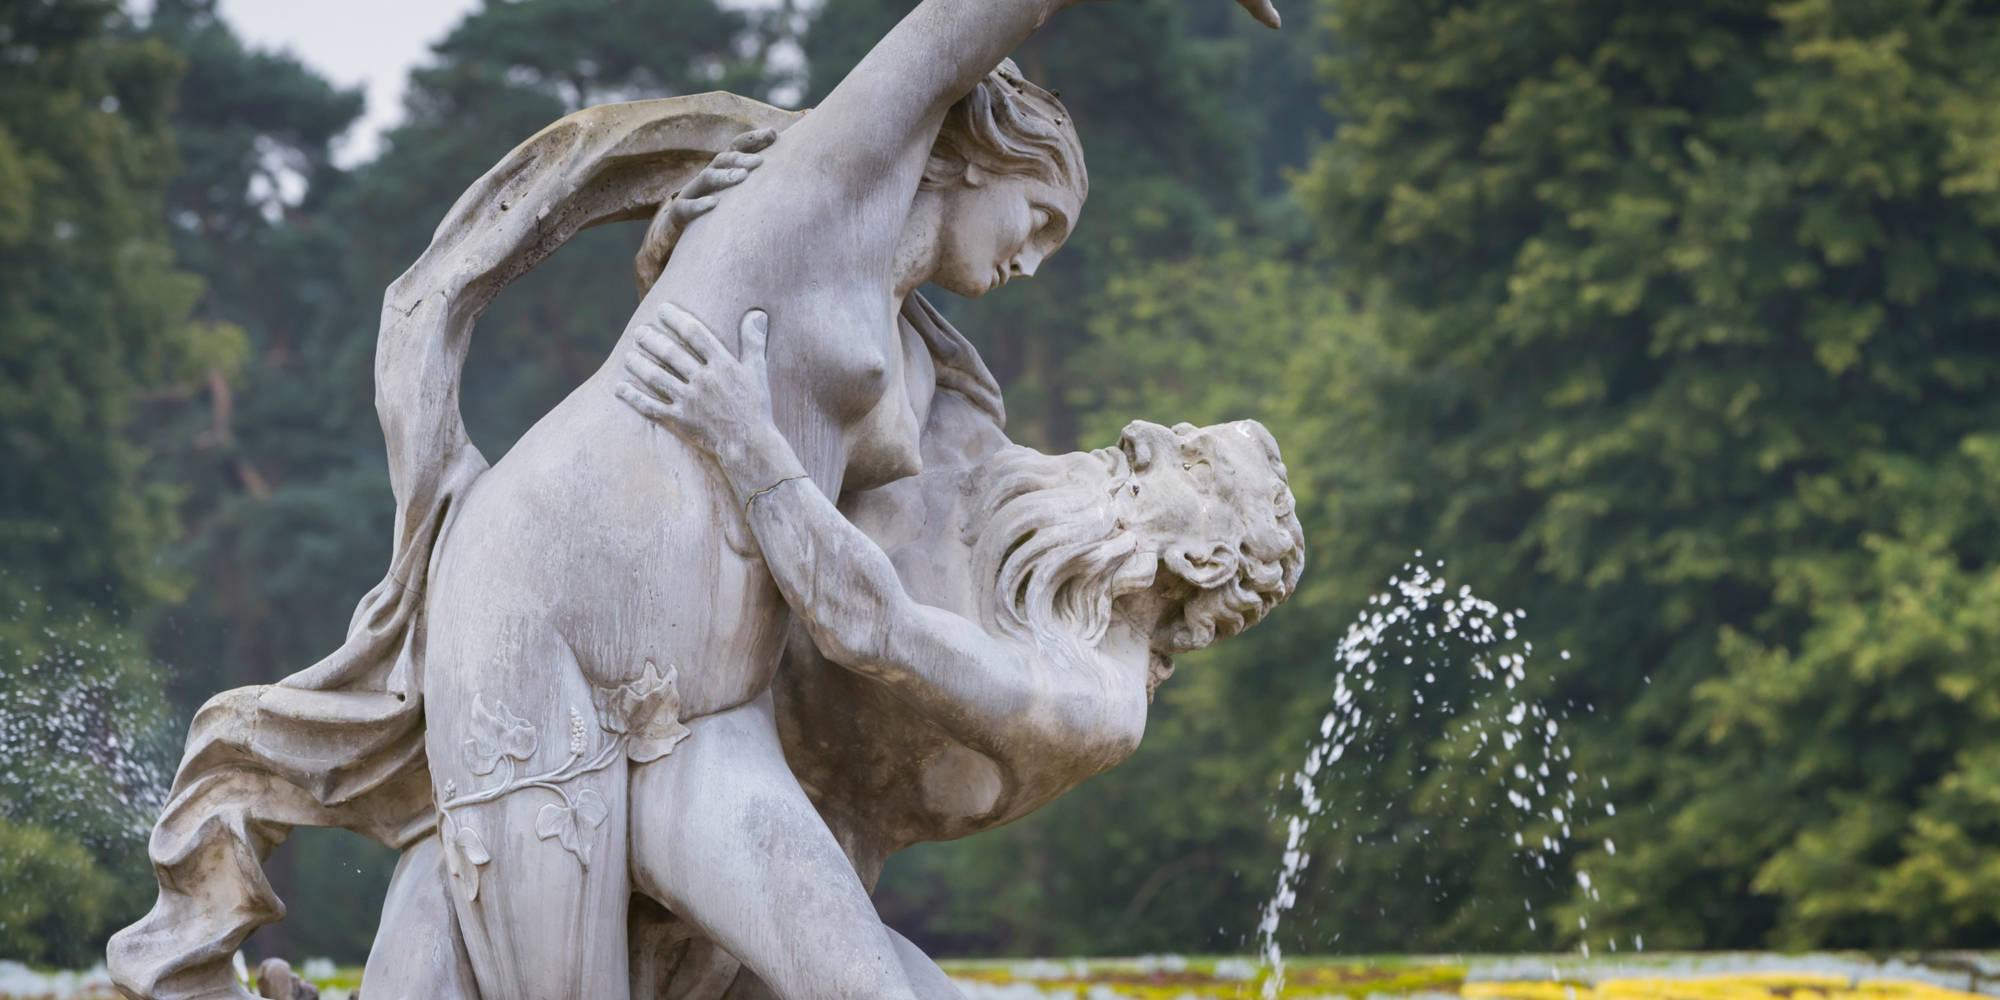 Parterre fountain